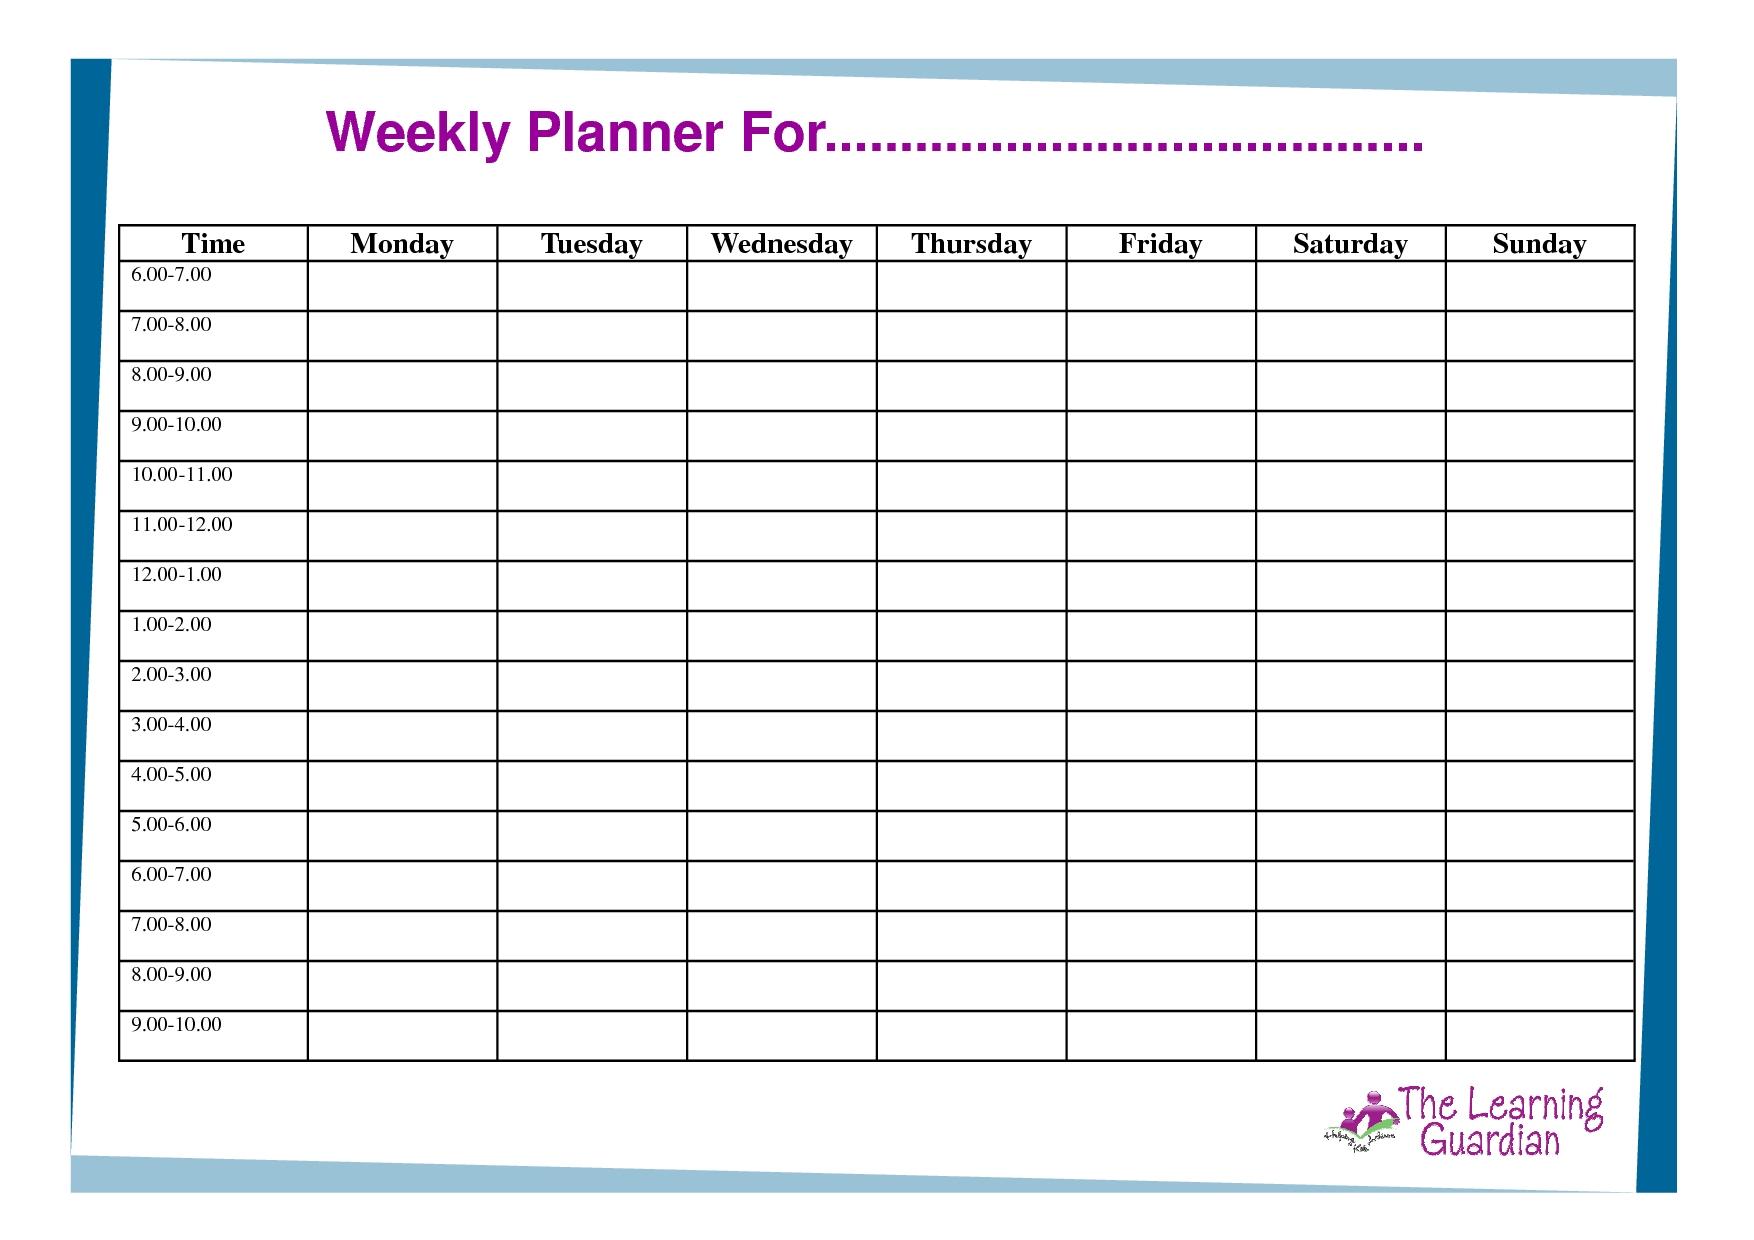 Free Printable Weekly Calendar Templates | Weekly Planner Weekly Calendar Printable Monday Friday